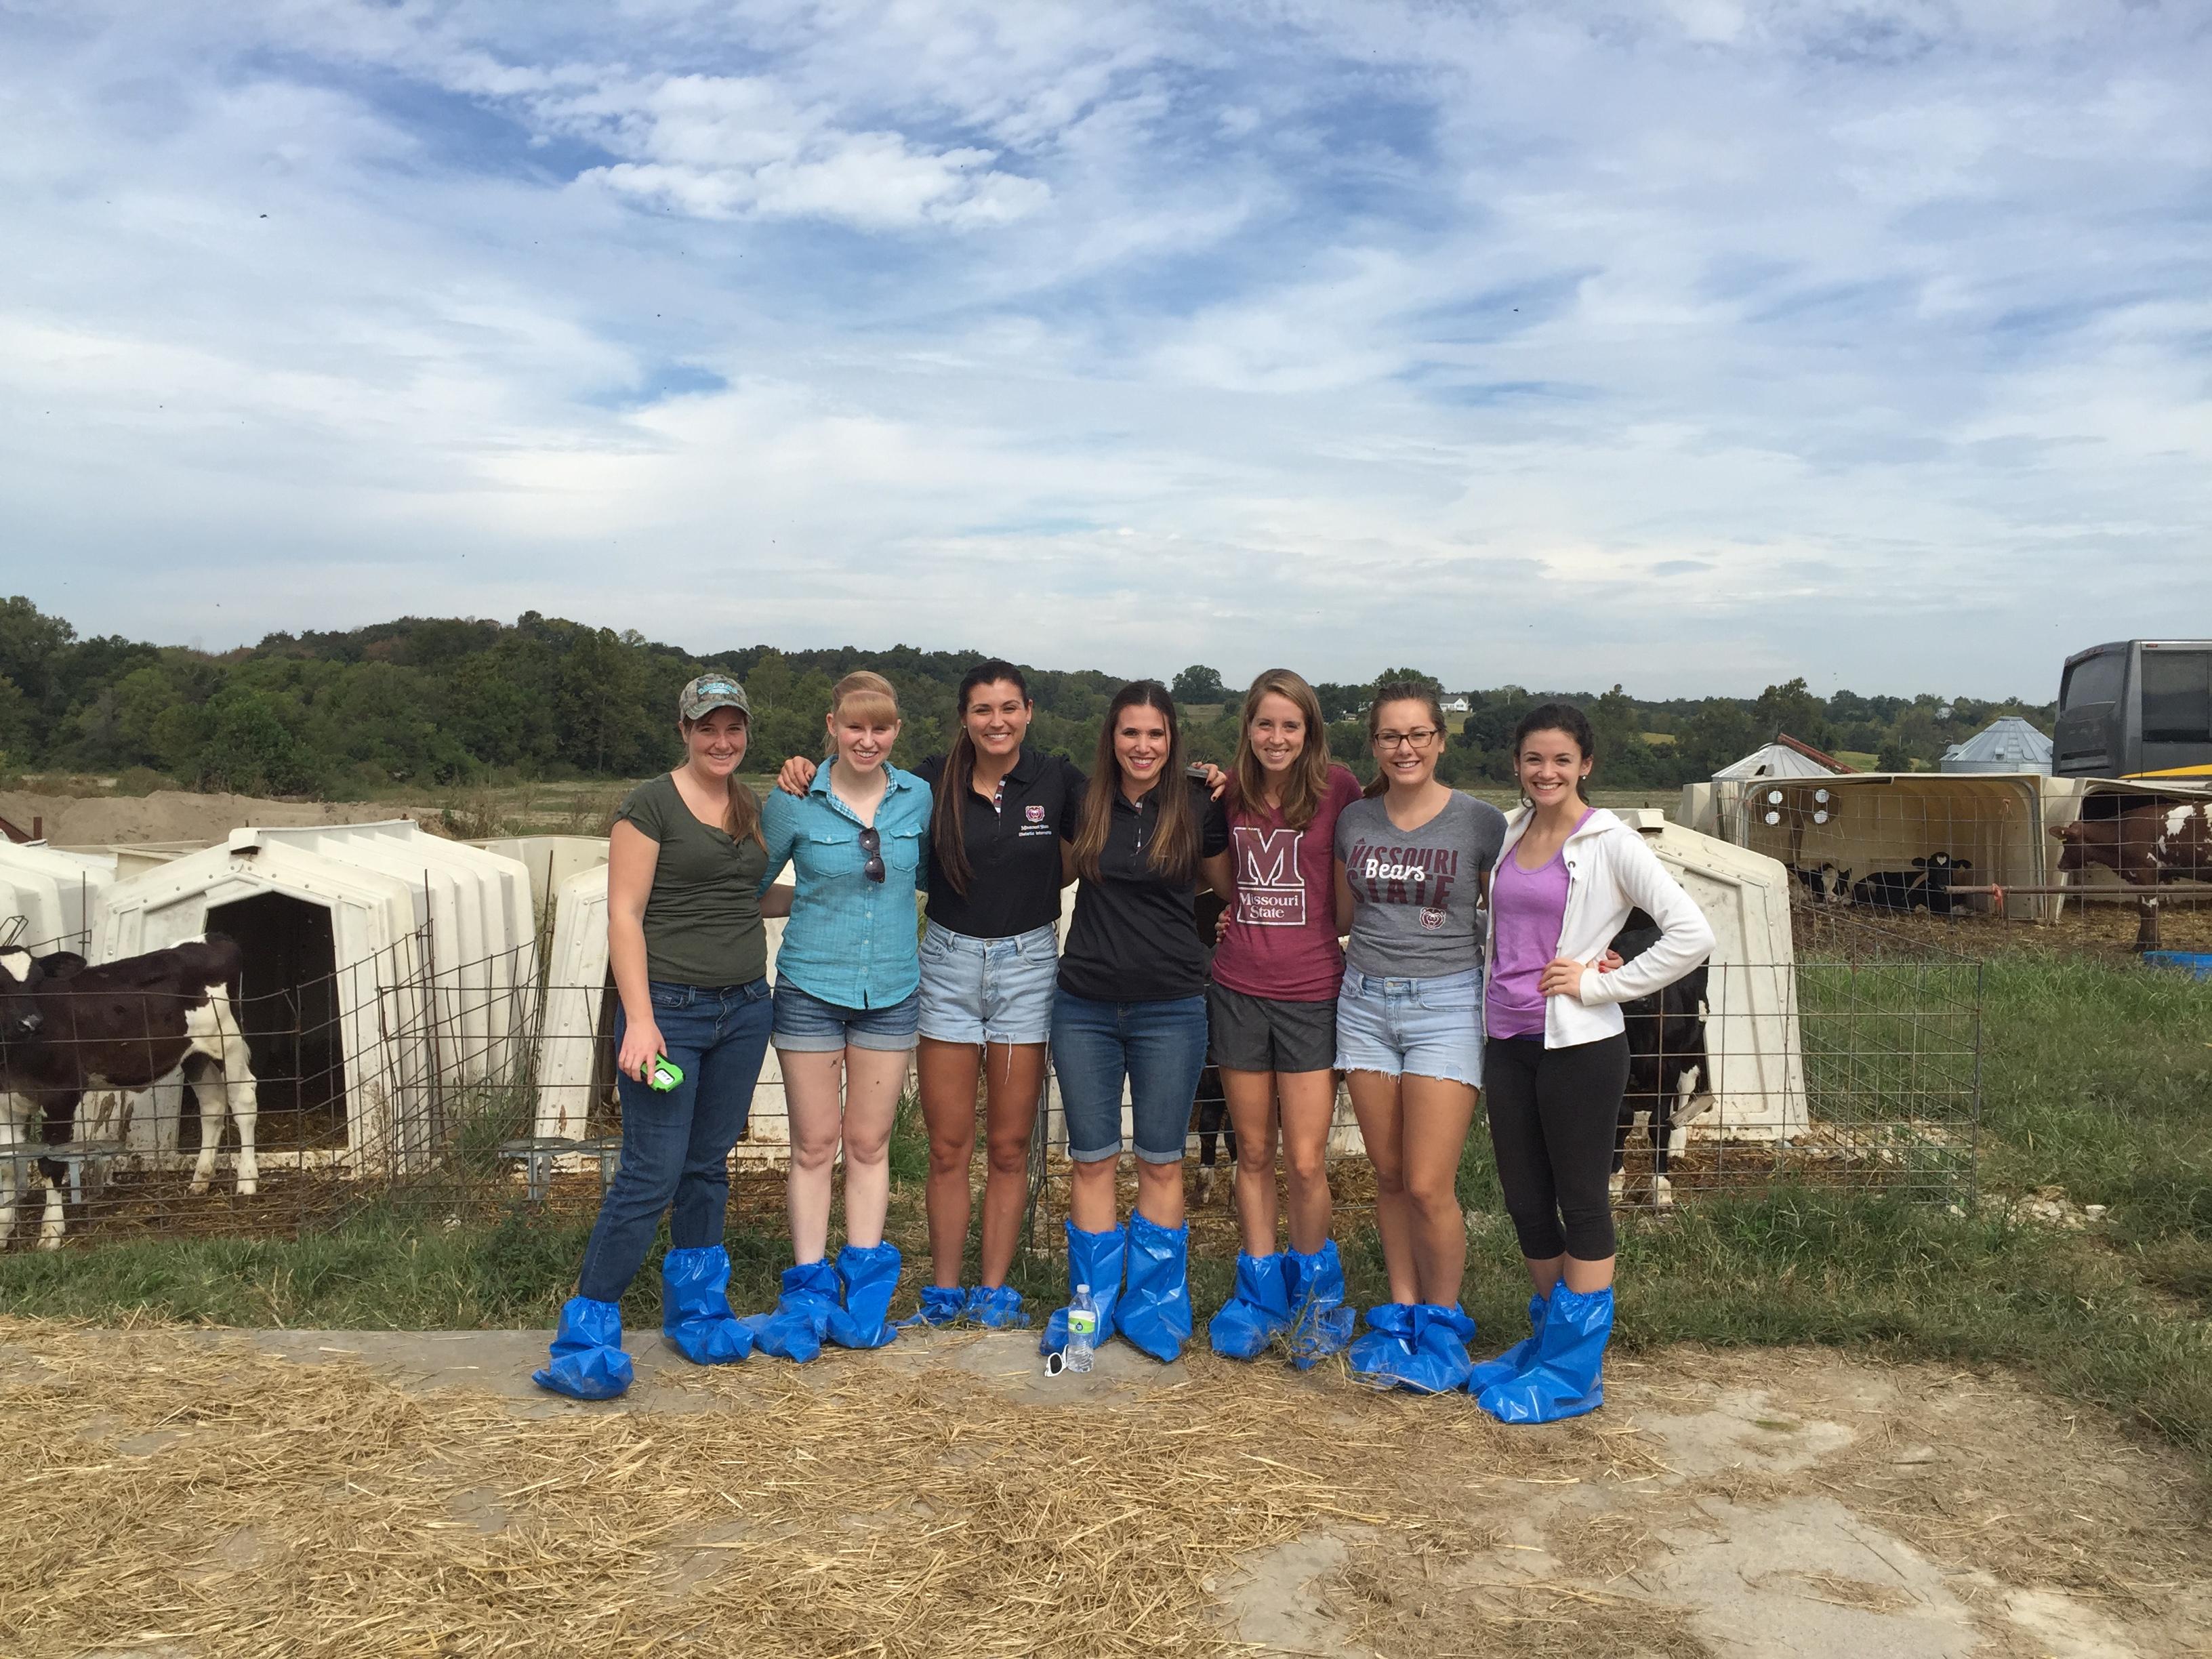 A Day at the Farm – Got Milk?